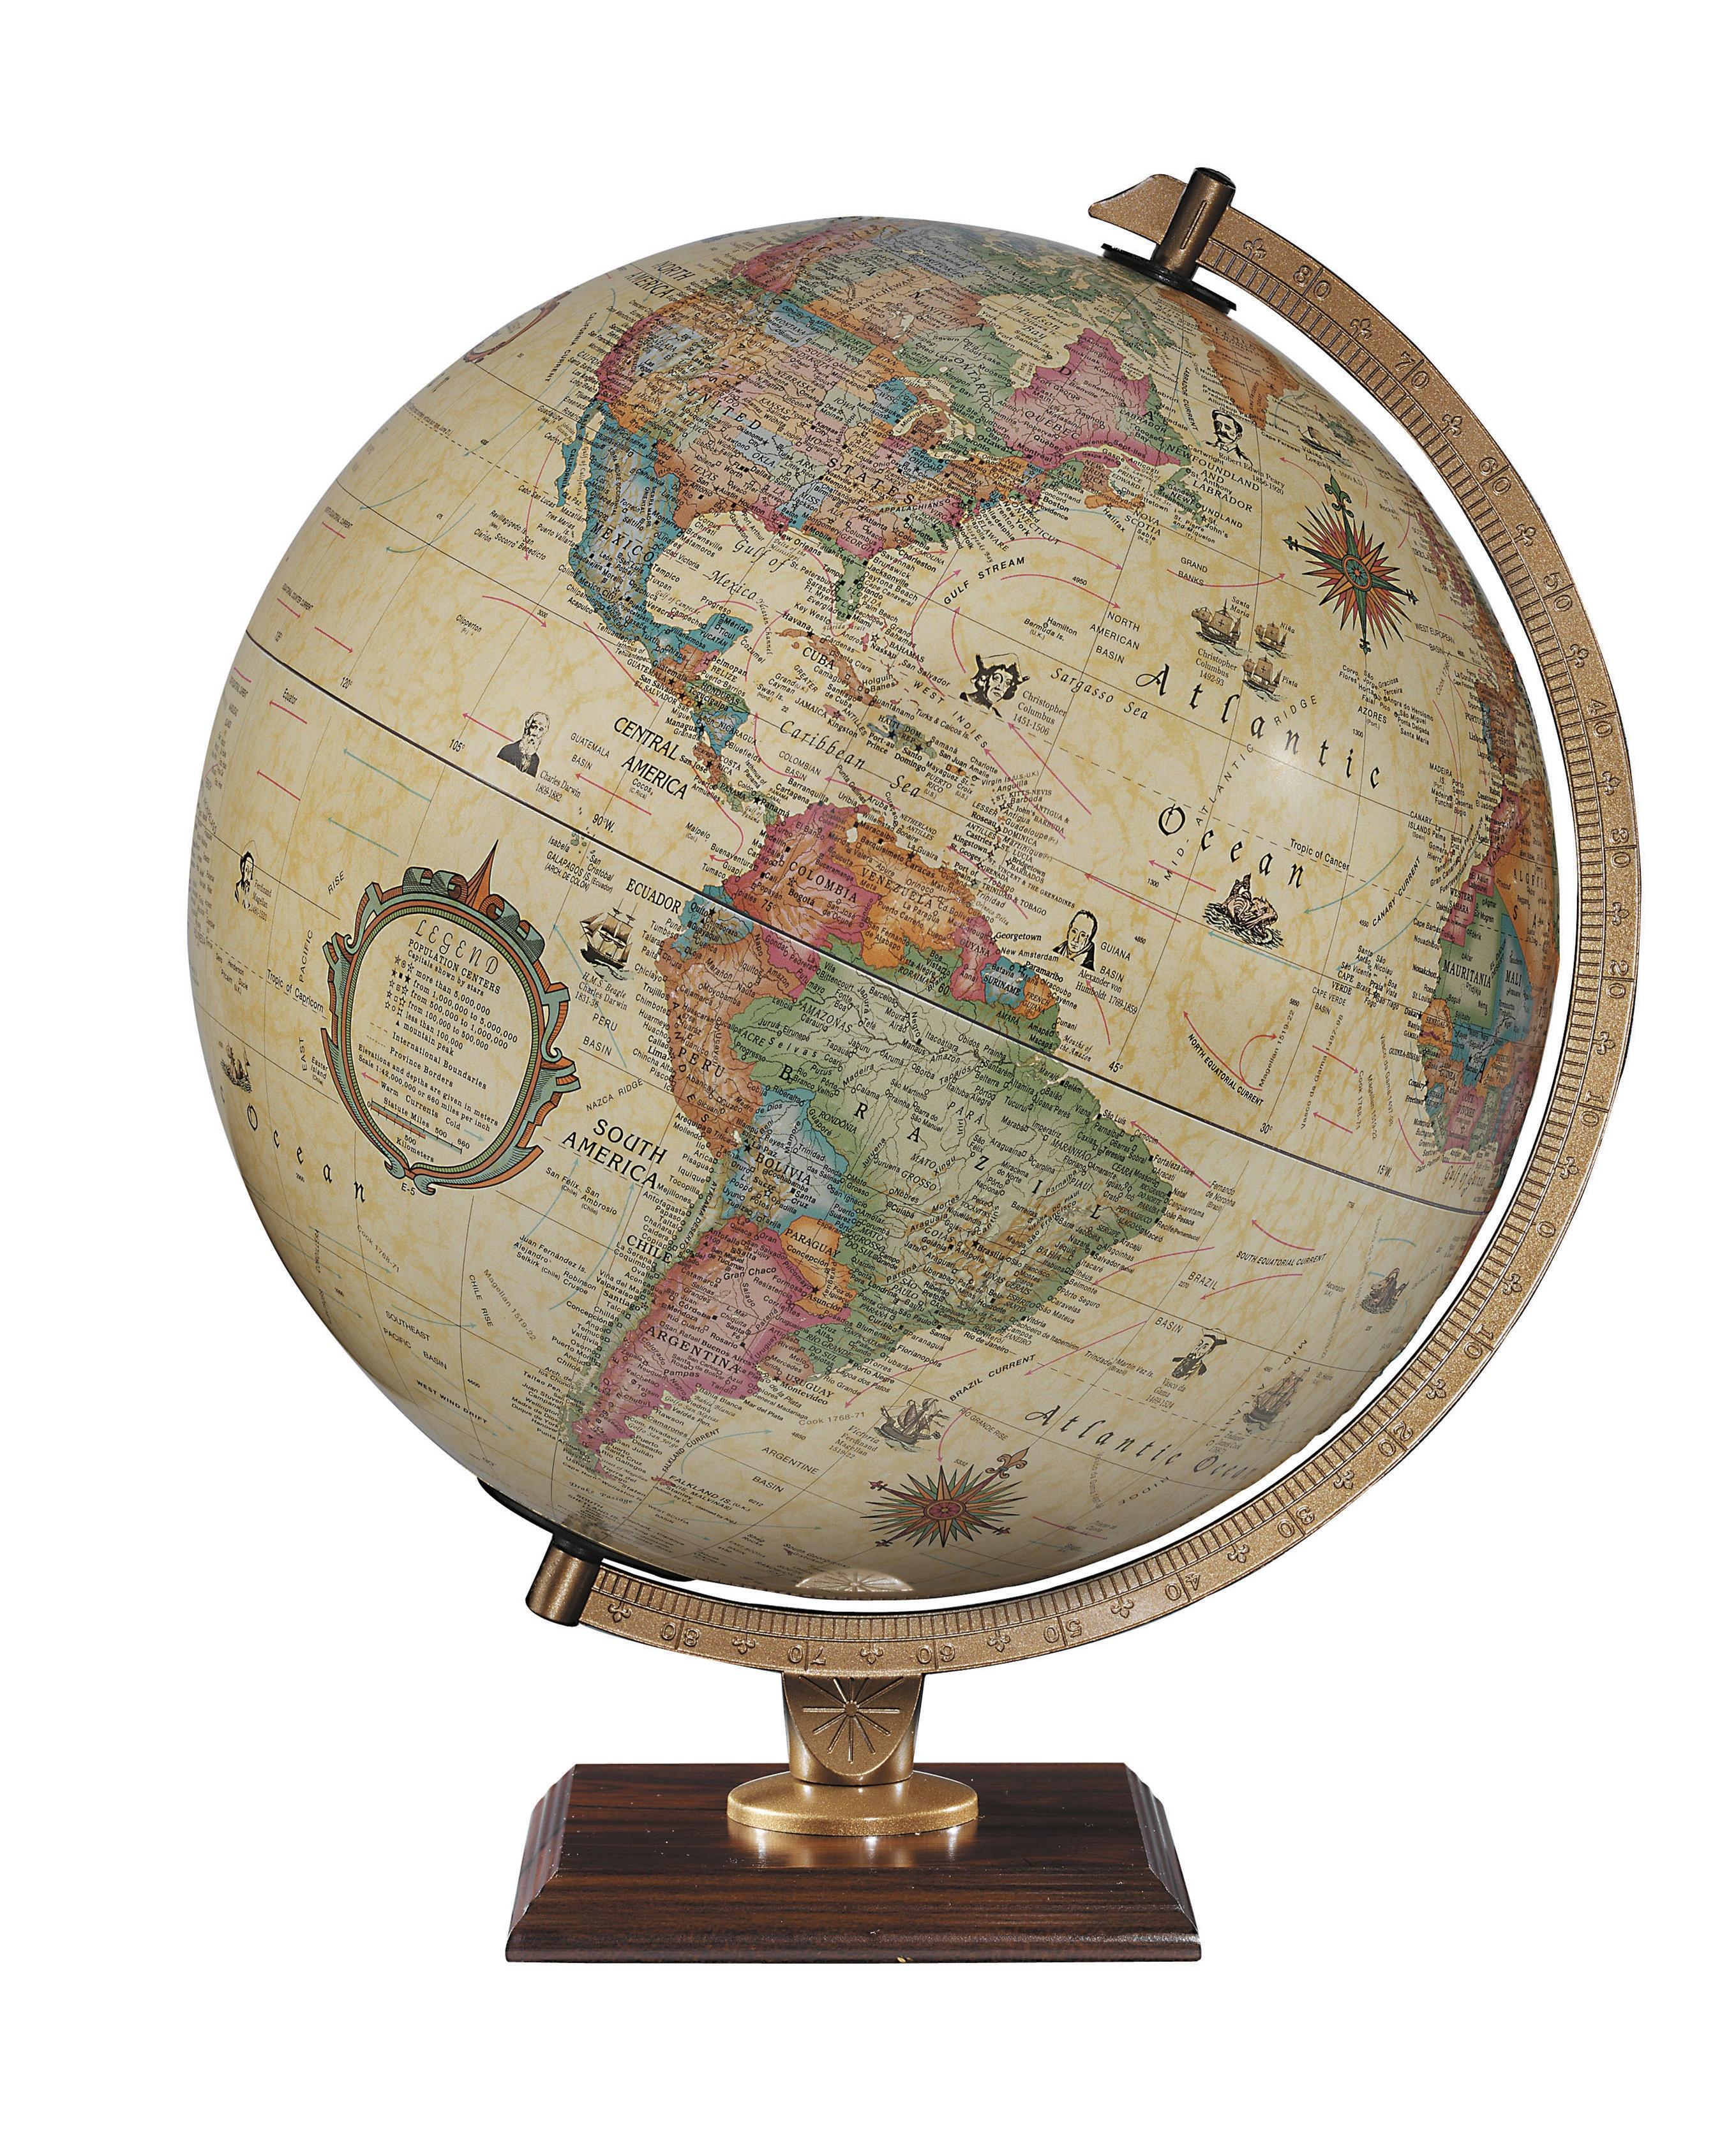 The Carlyle World Globe - Illuminated